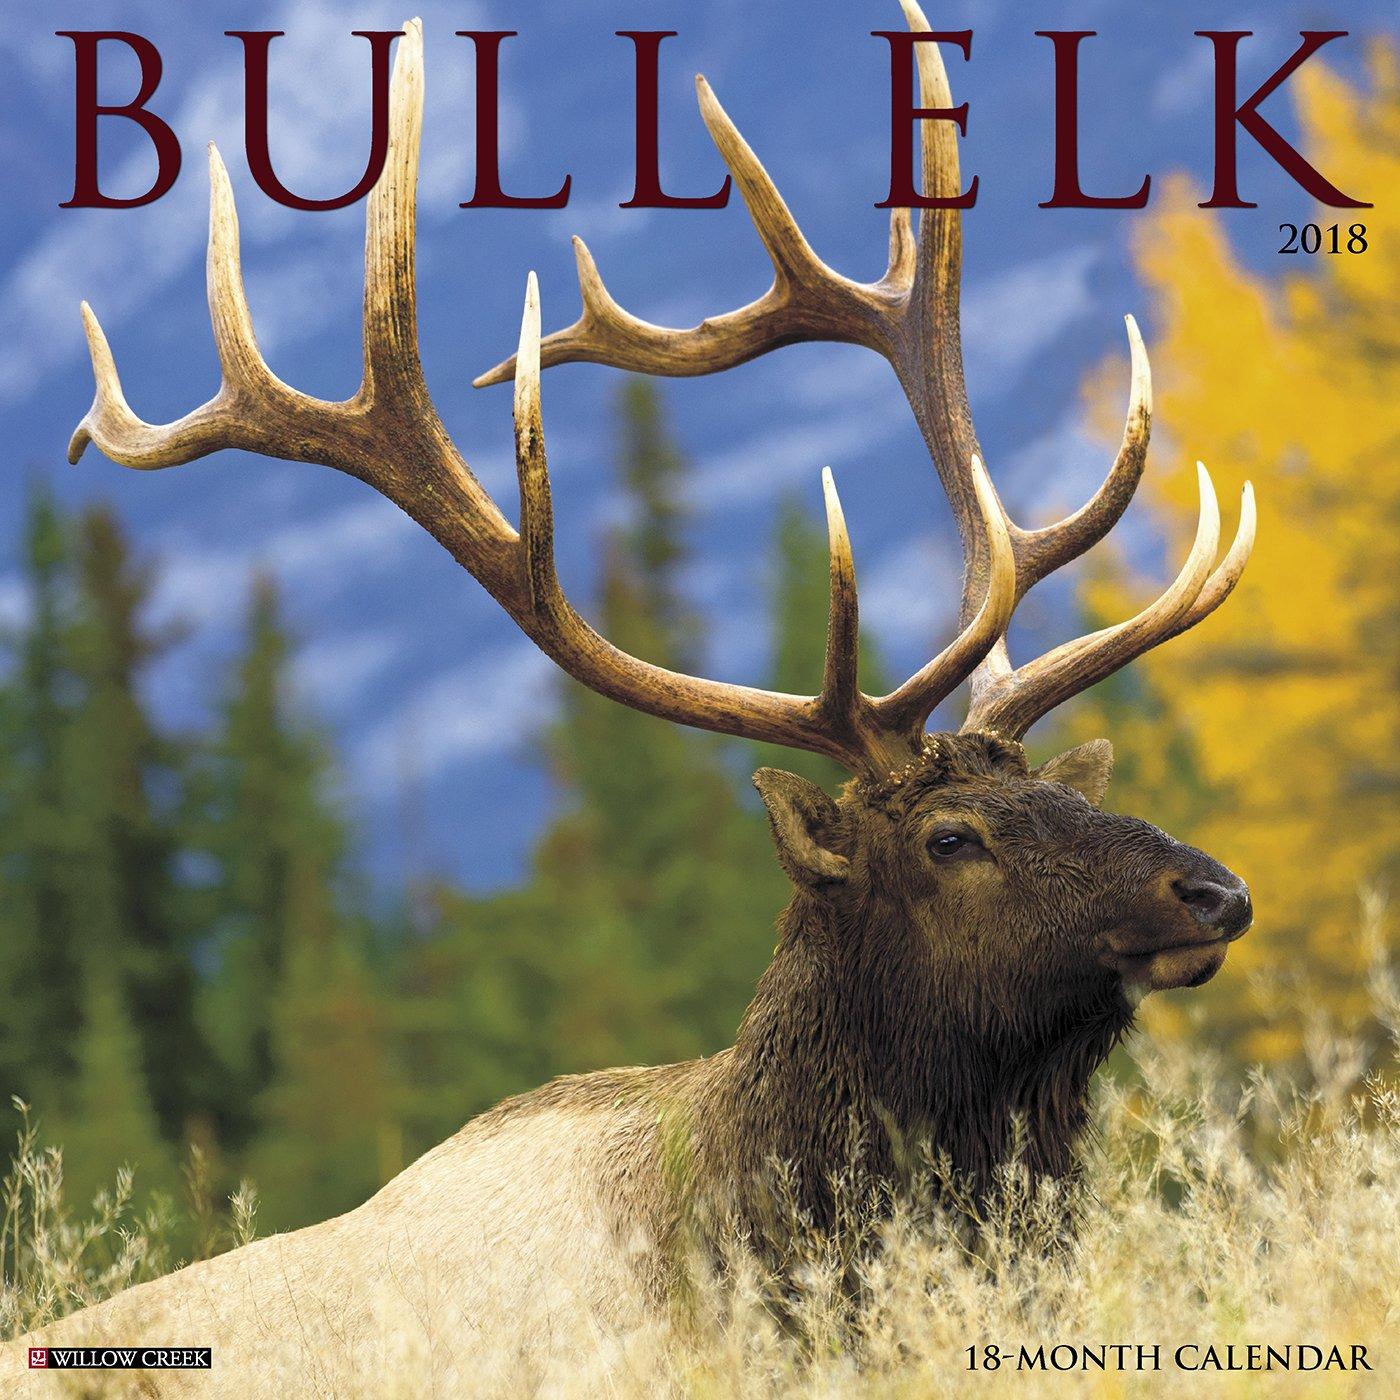 Bull Elk 2018 Calendar pdf